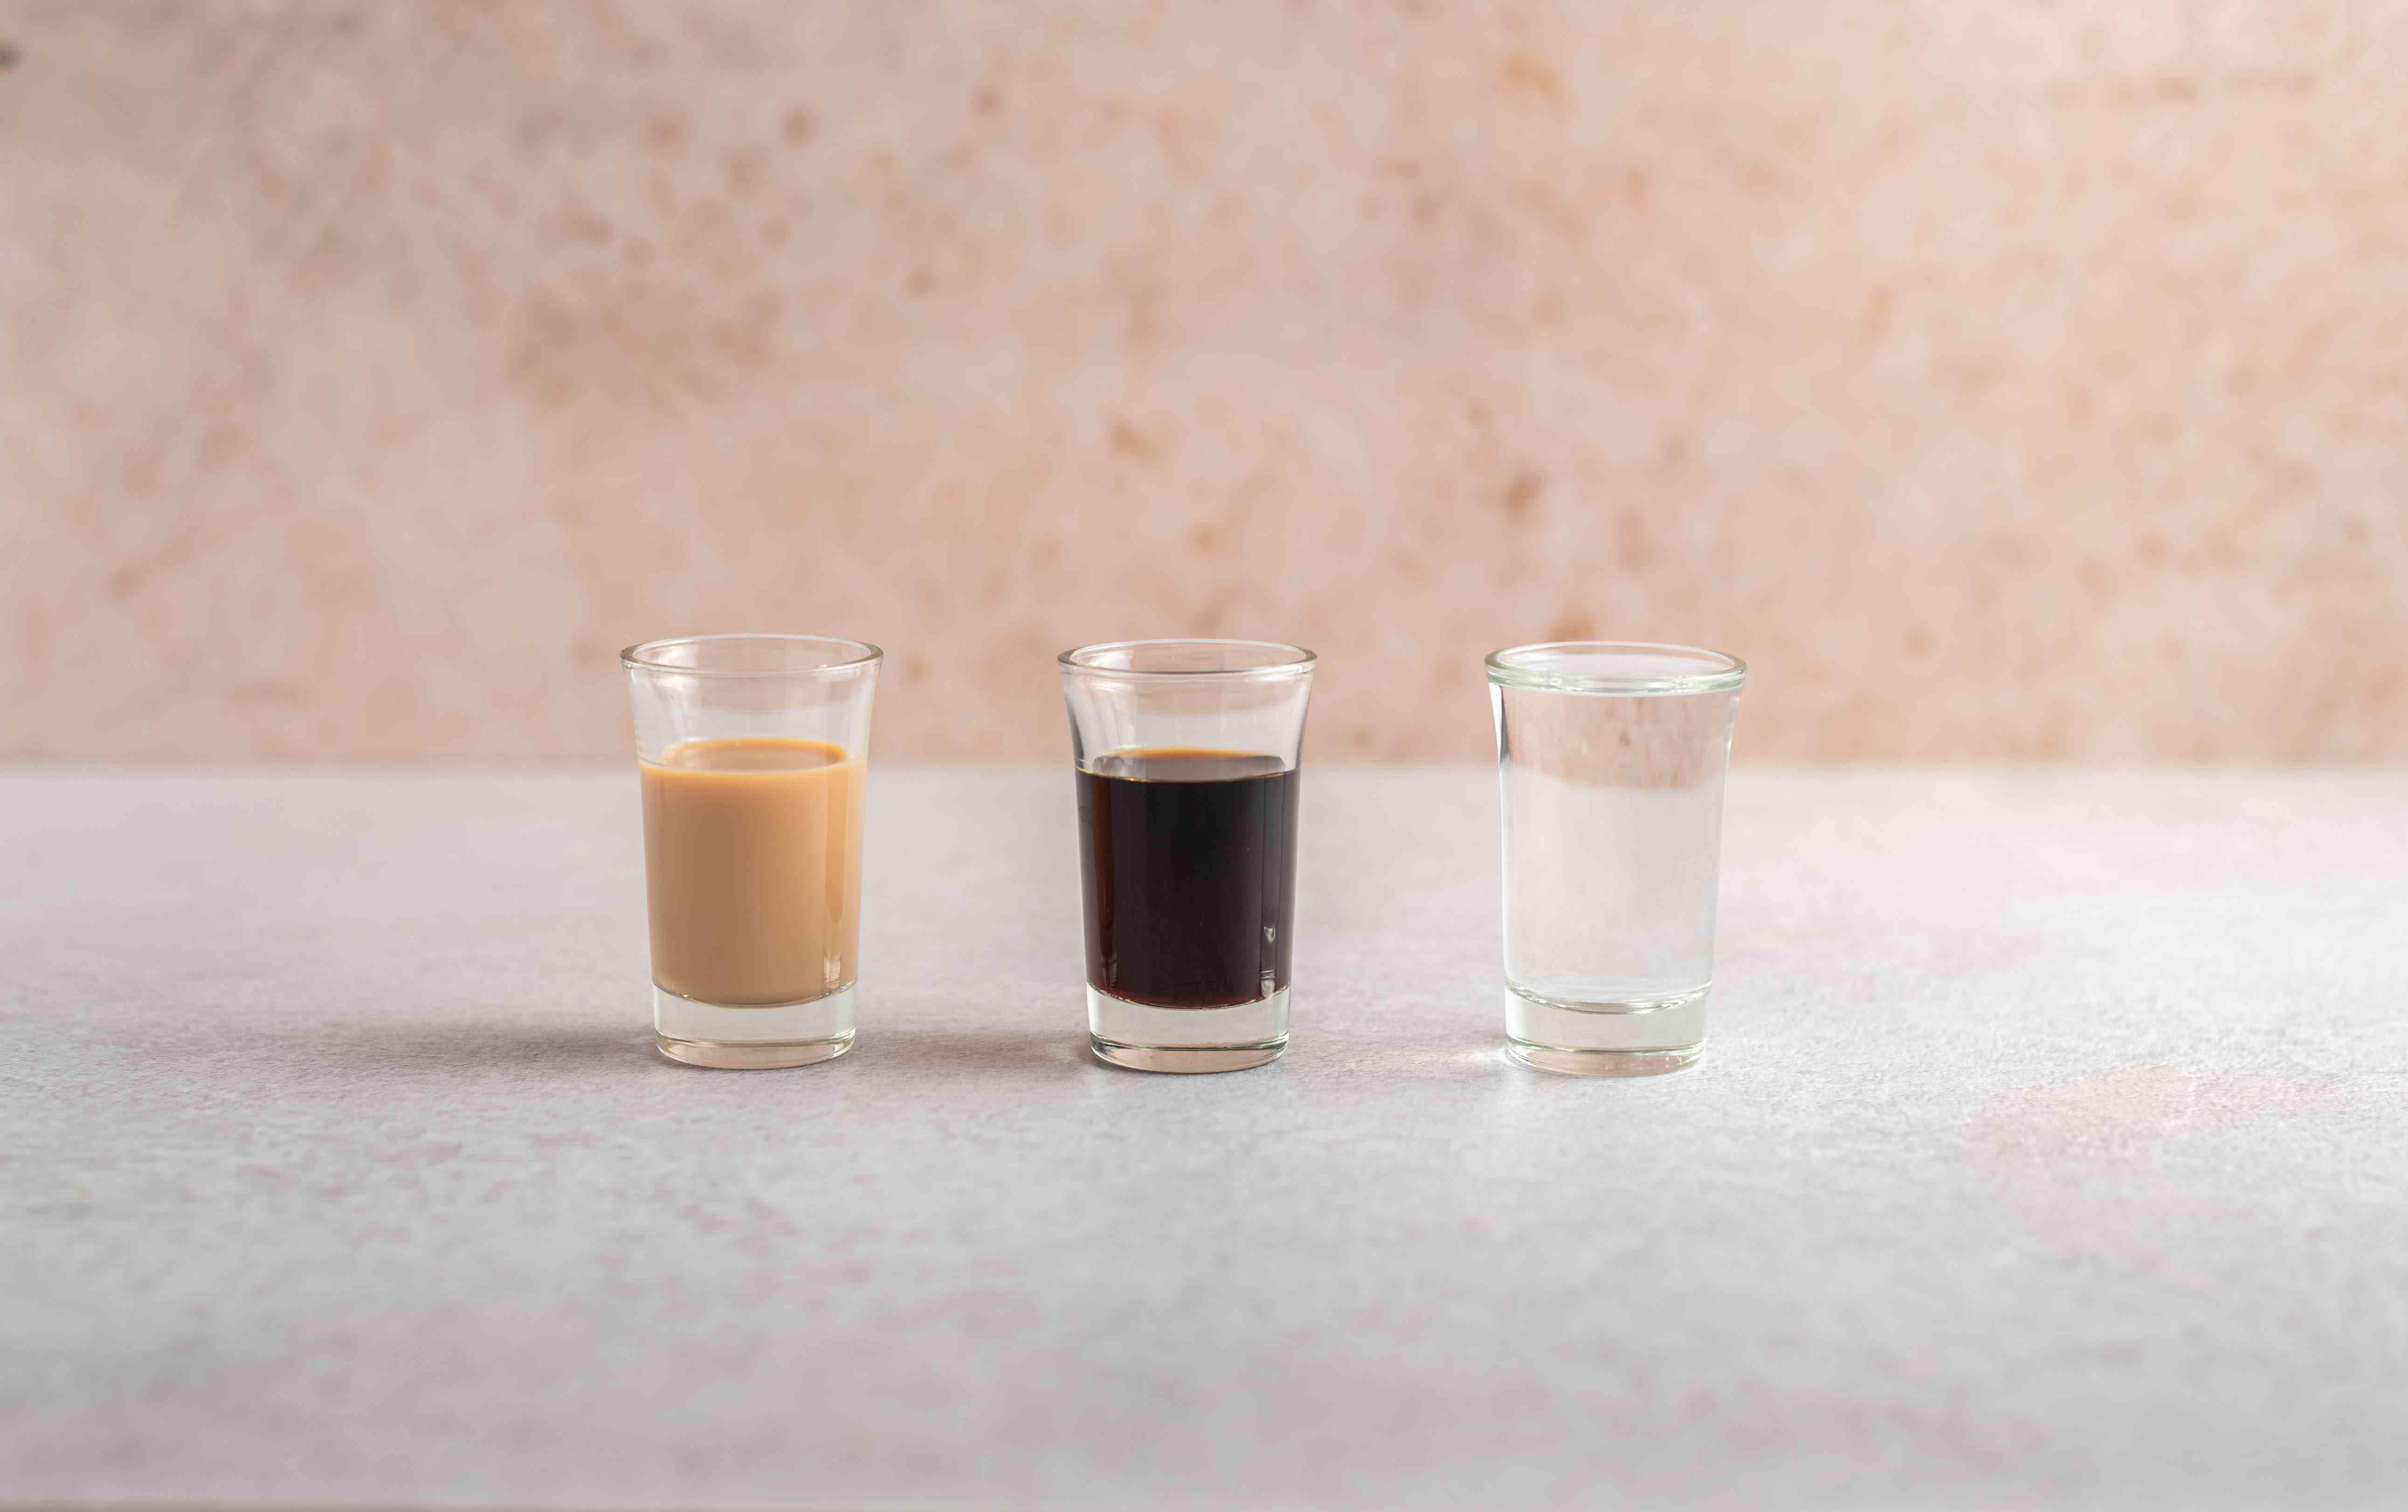 Ingredients for making a mudslide cocktail